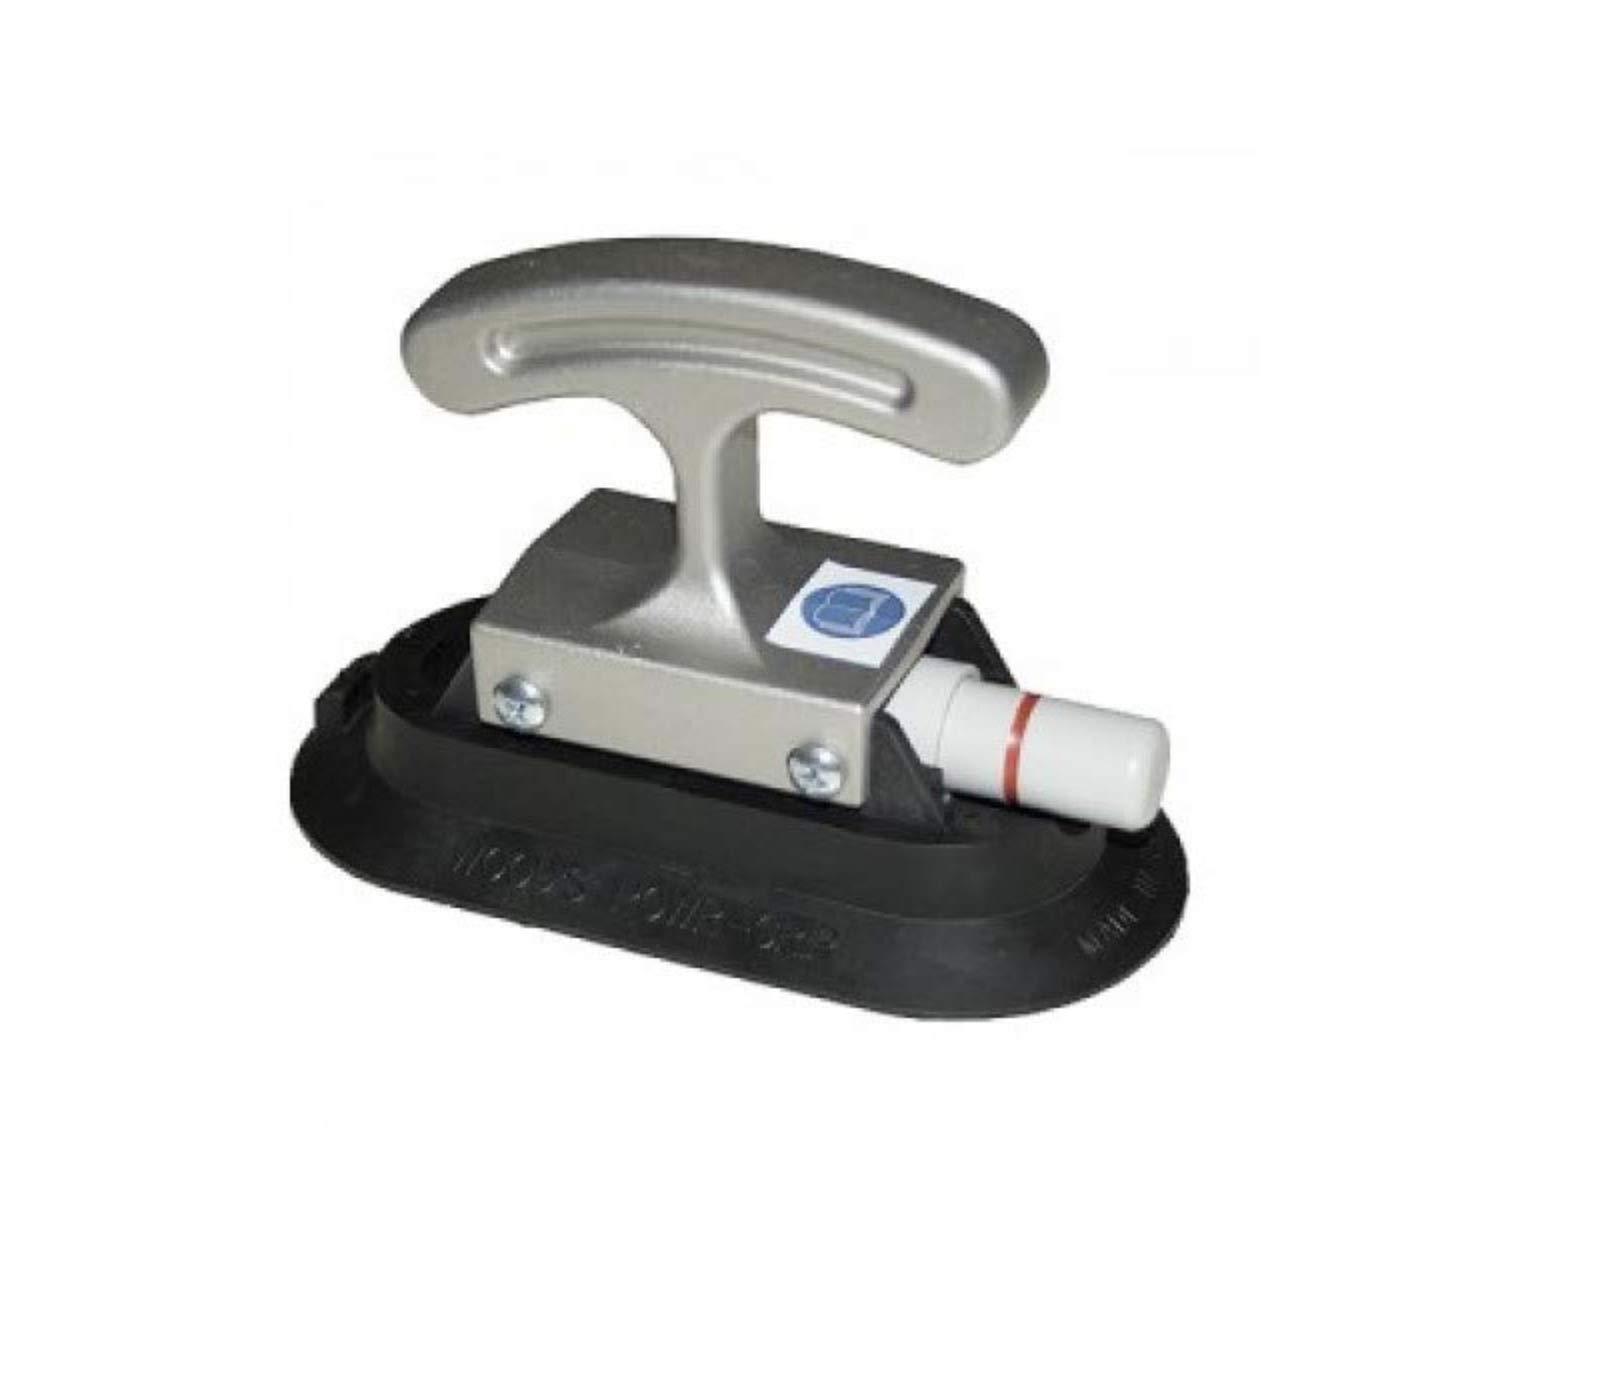 Wood's Powr-Grip 3'' x 6'' RF36HG Vacuum Suction Cup w/ Aluminum Handi-Grip Handle 40 lbs. Capacity by Wood's Powr-Grip